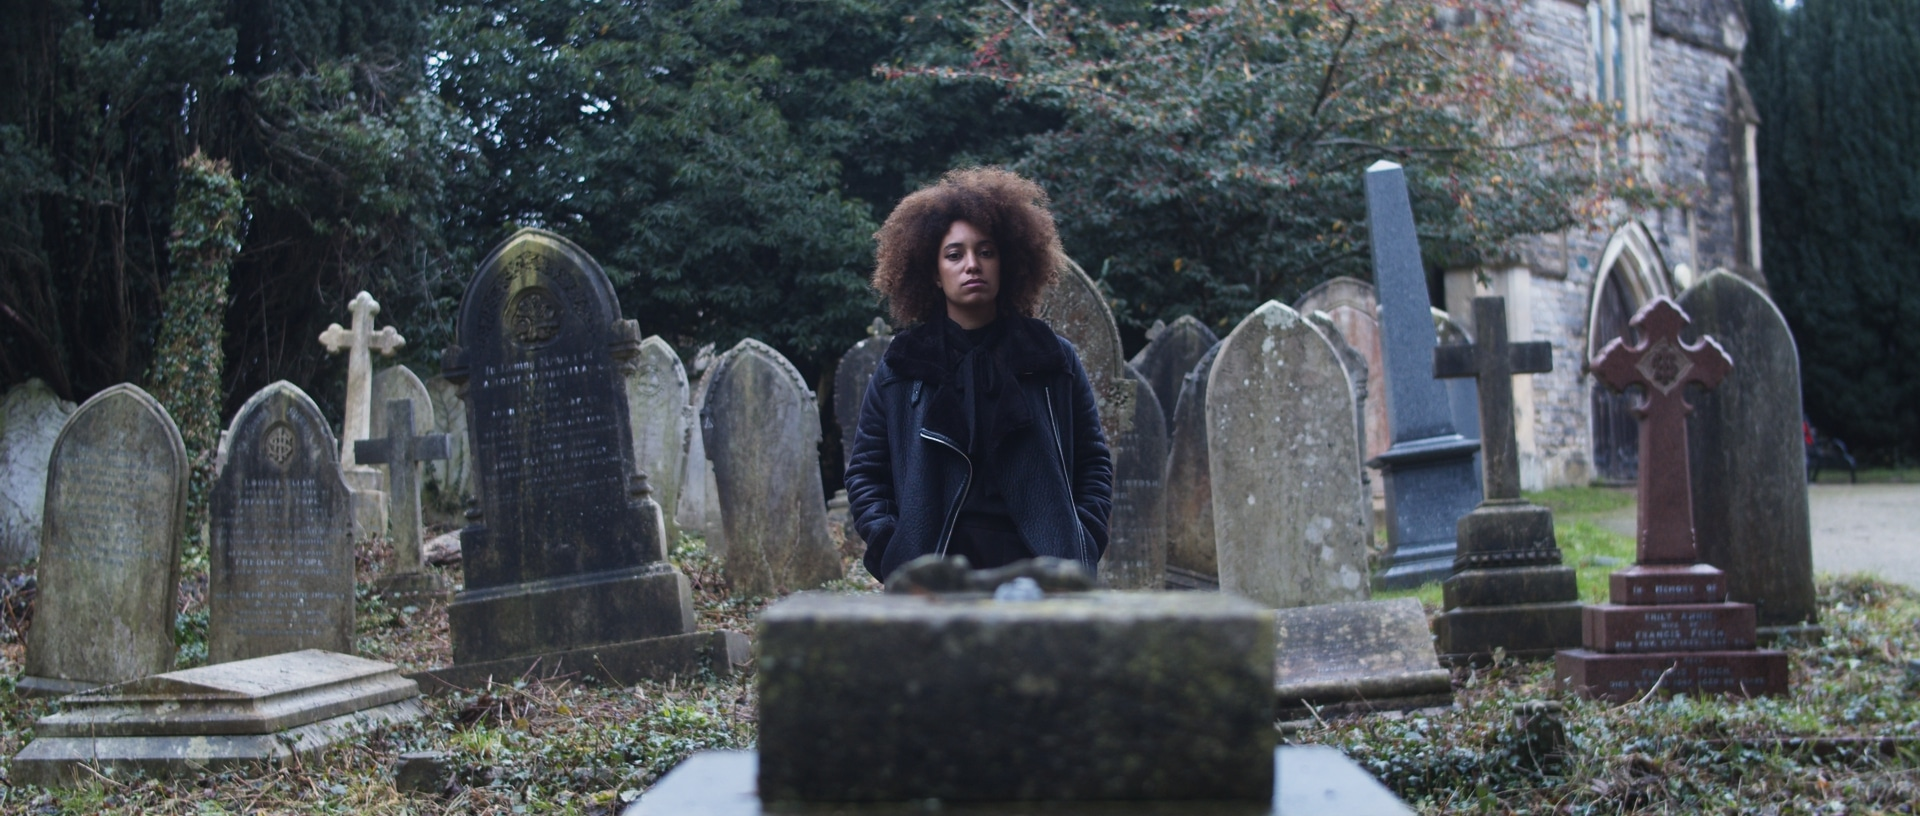 Voyager Still with temp grade, a Liam Calvert short film starring Sophie Delora Jones and shot by Matthias Djan DoP